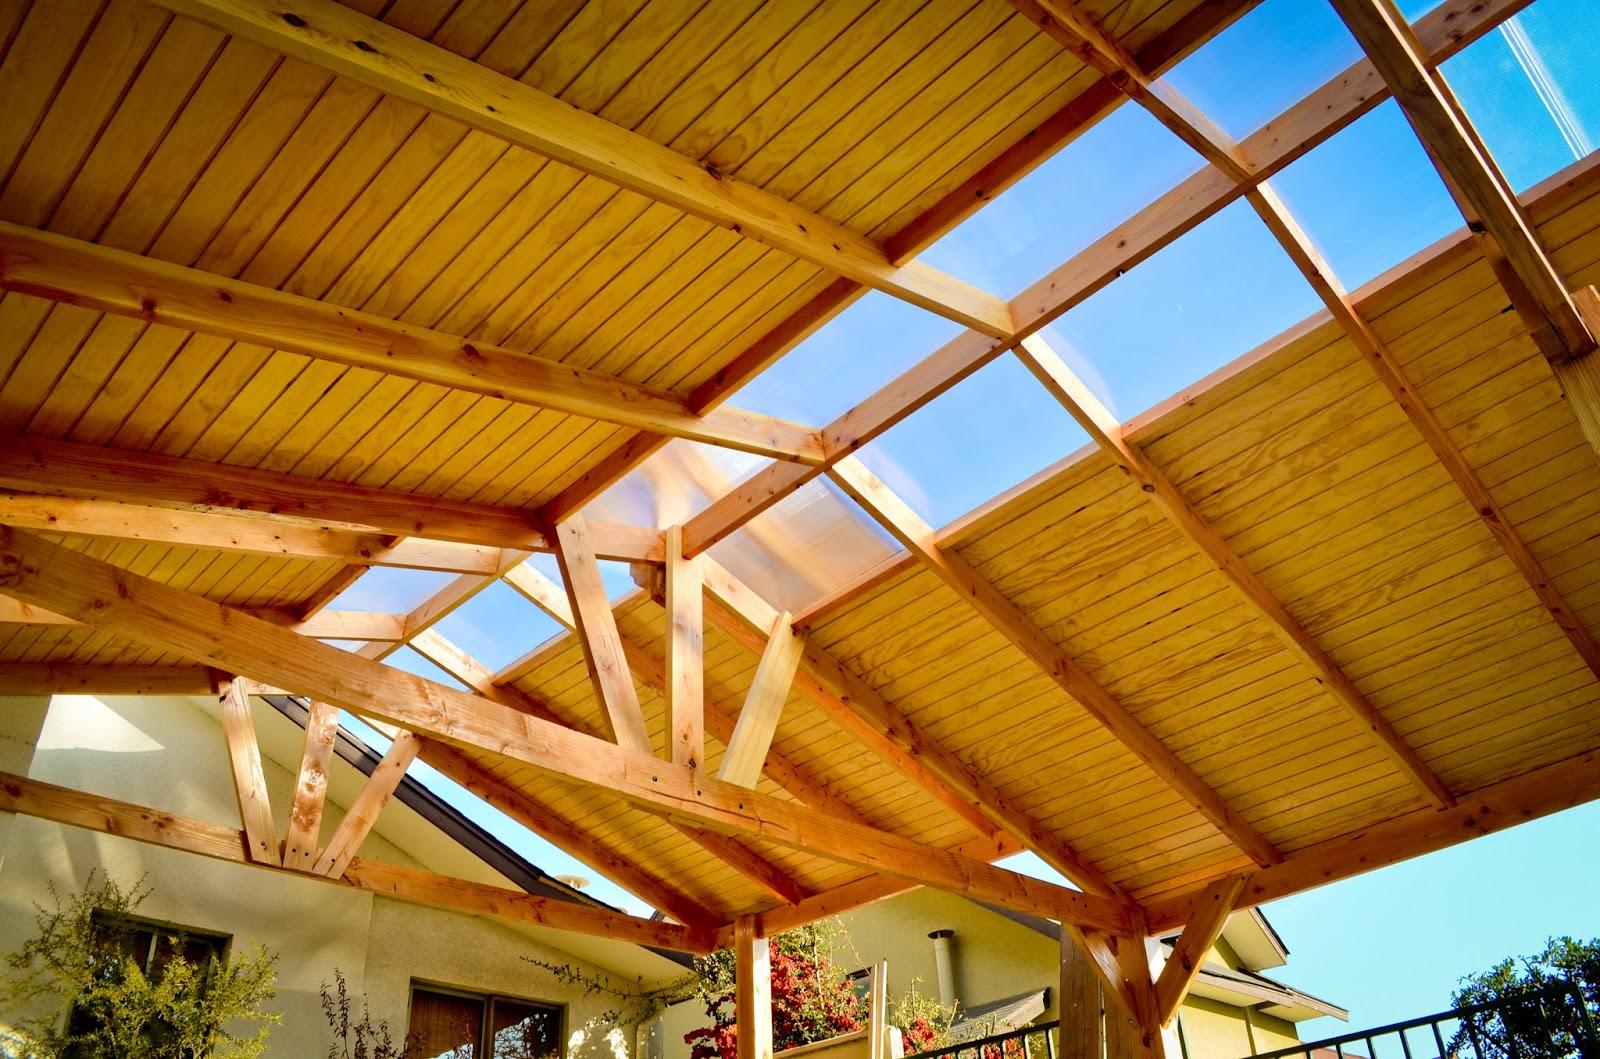 Cobertizo pino oreg n policarbonato teja asf ltica for Cobertizo de madera tratada